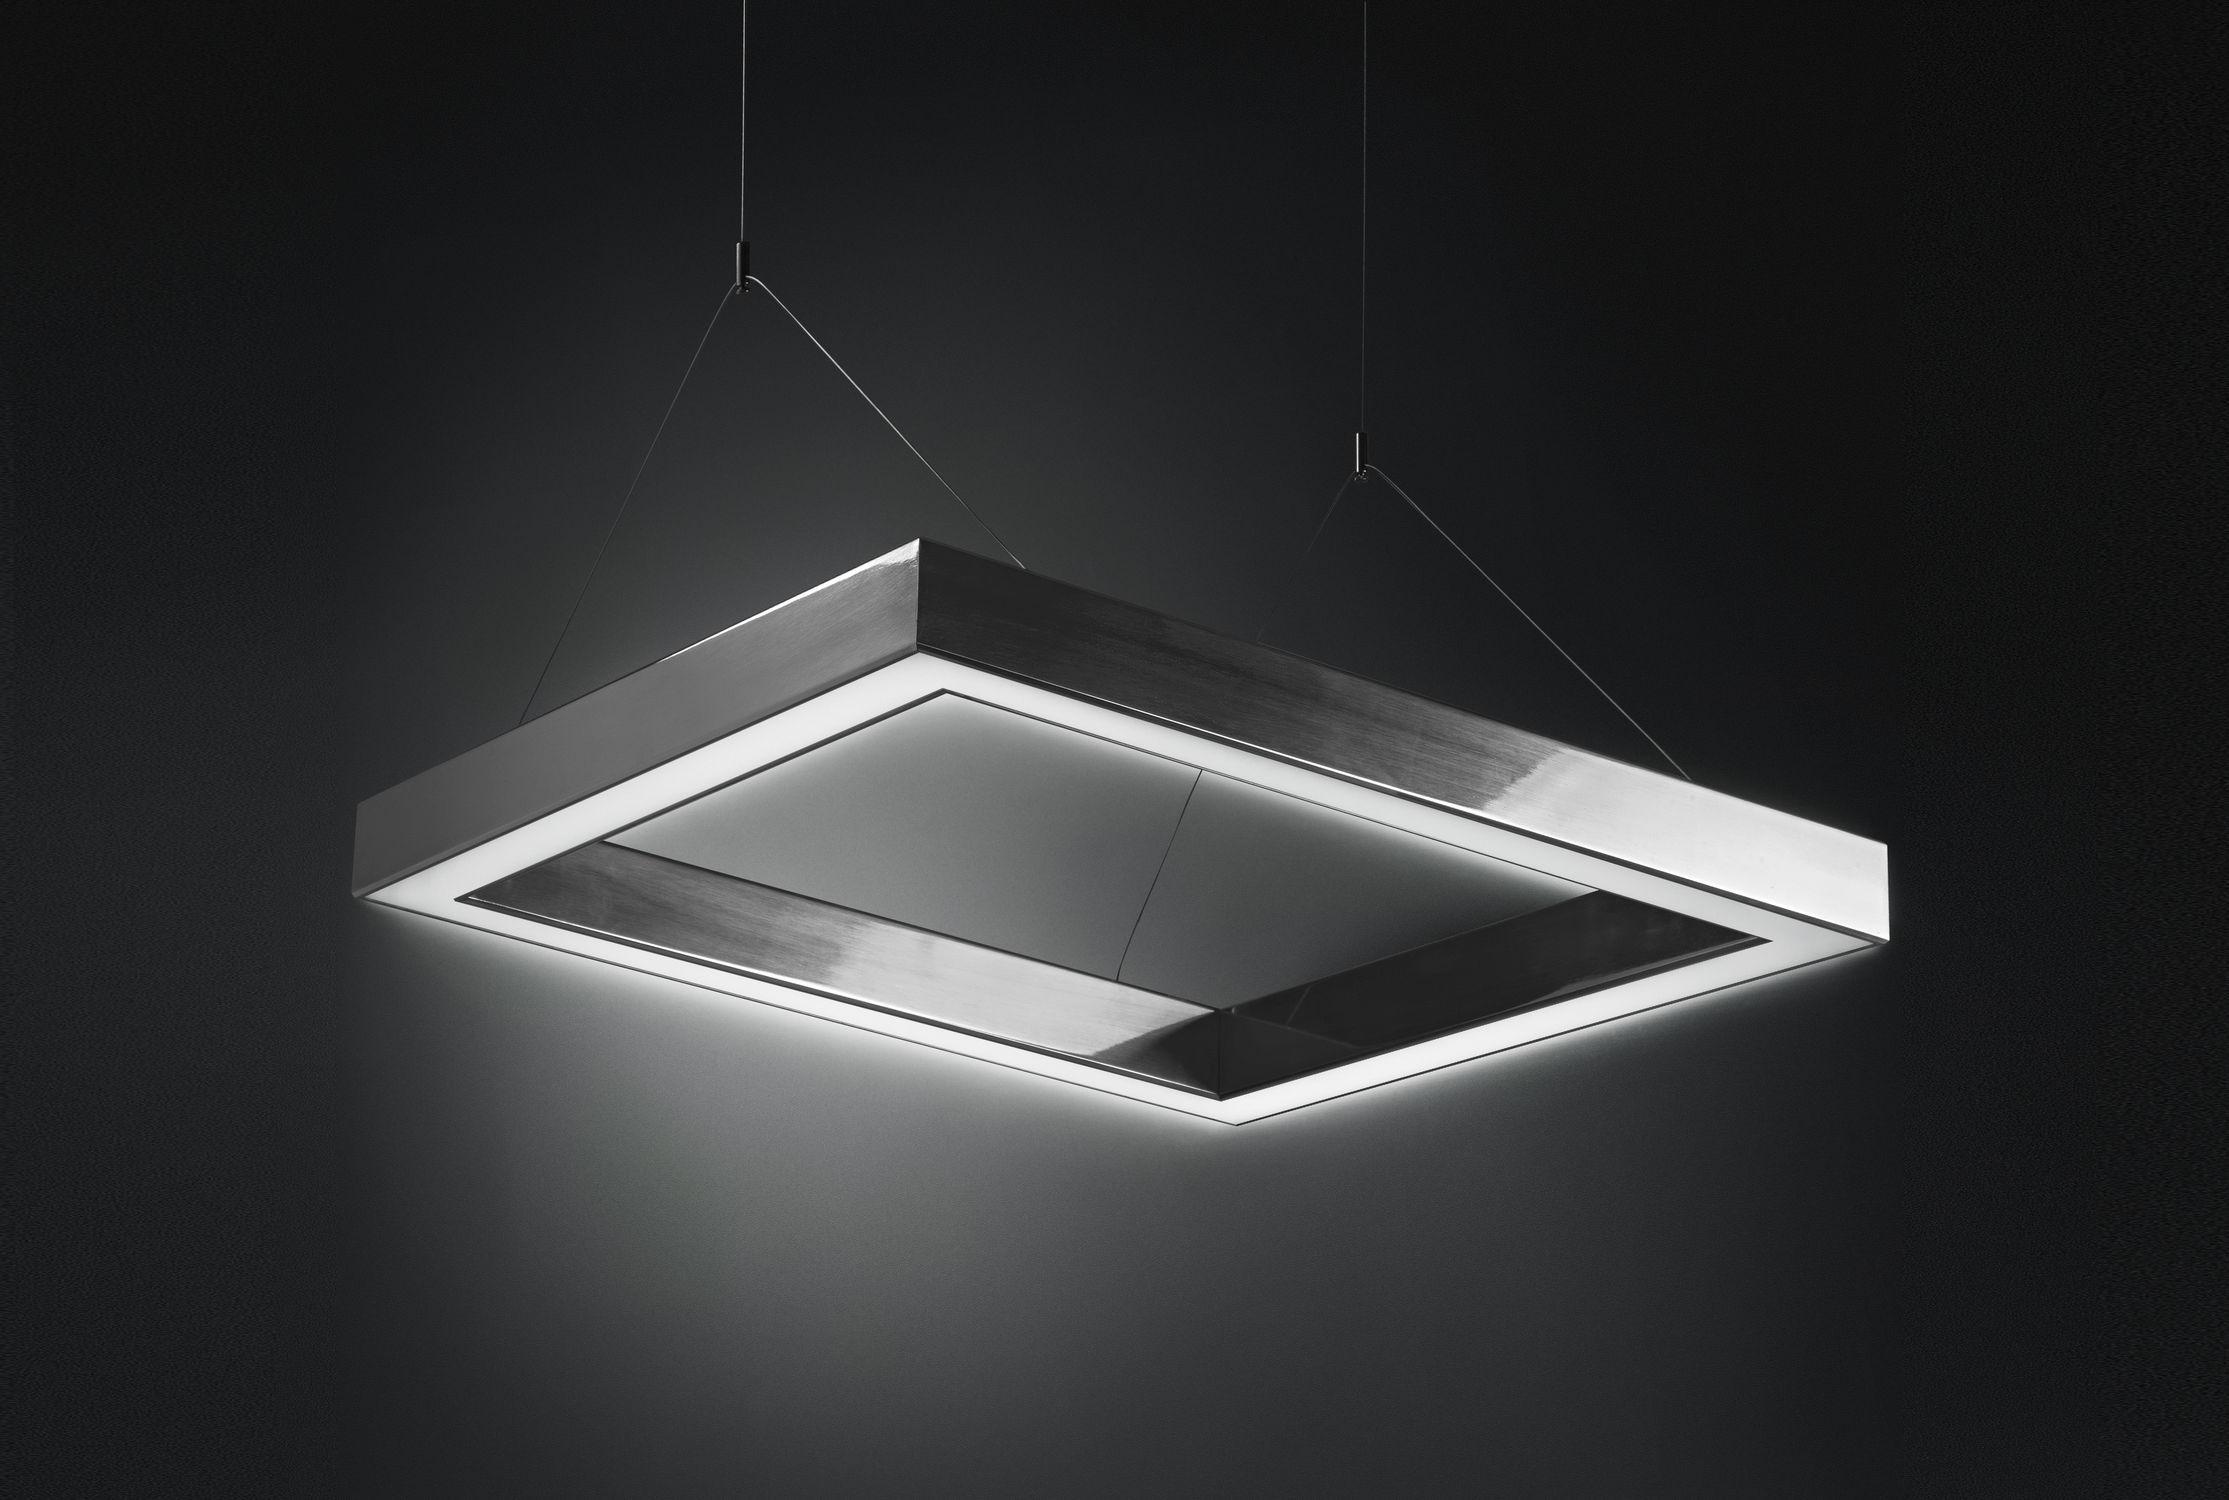 ... Hanging light fixture / LED / square / rectangular DINAMICA Q PLEXIFORM  ...